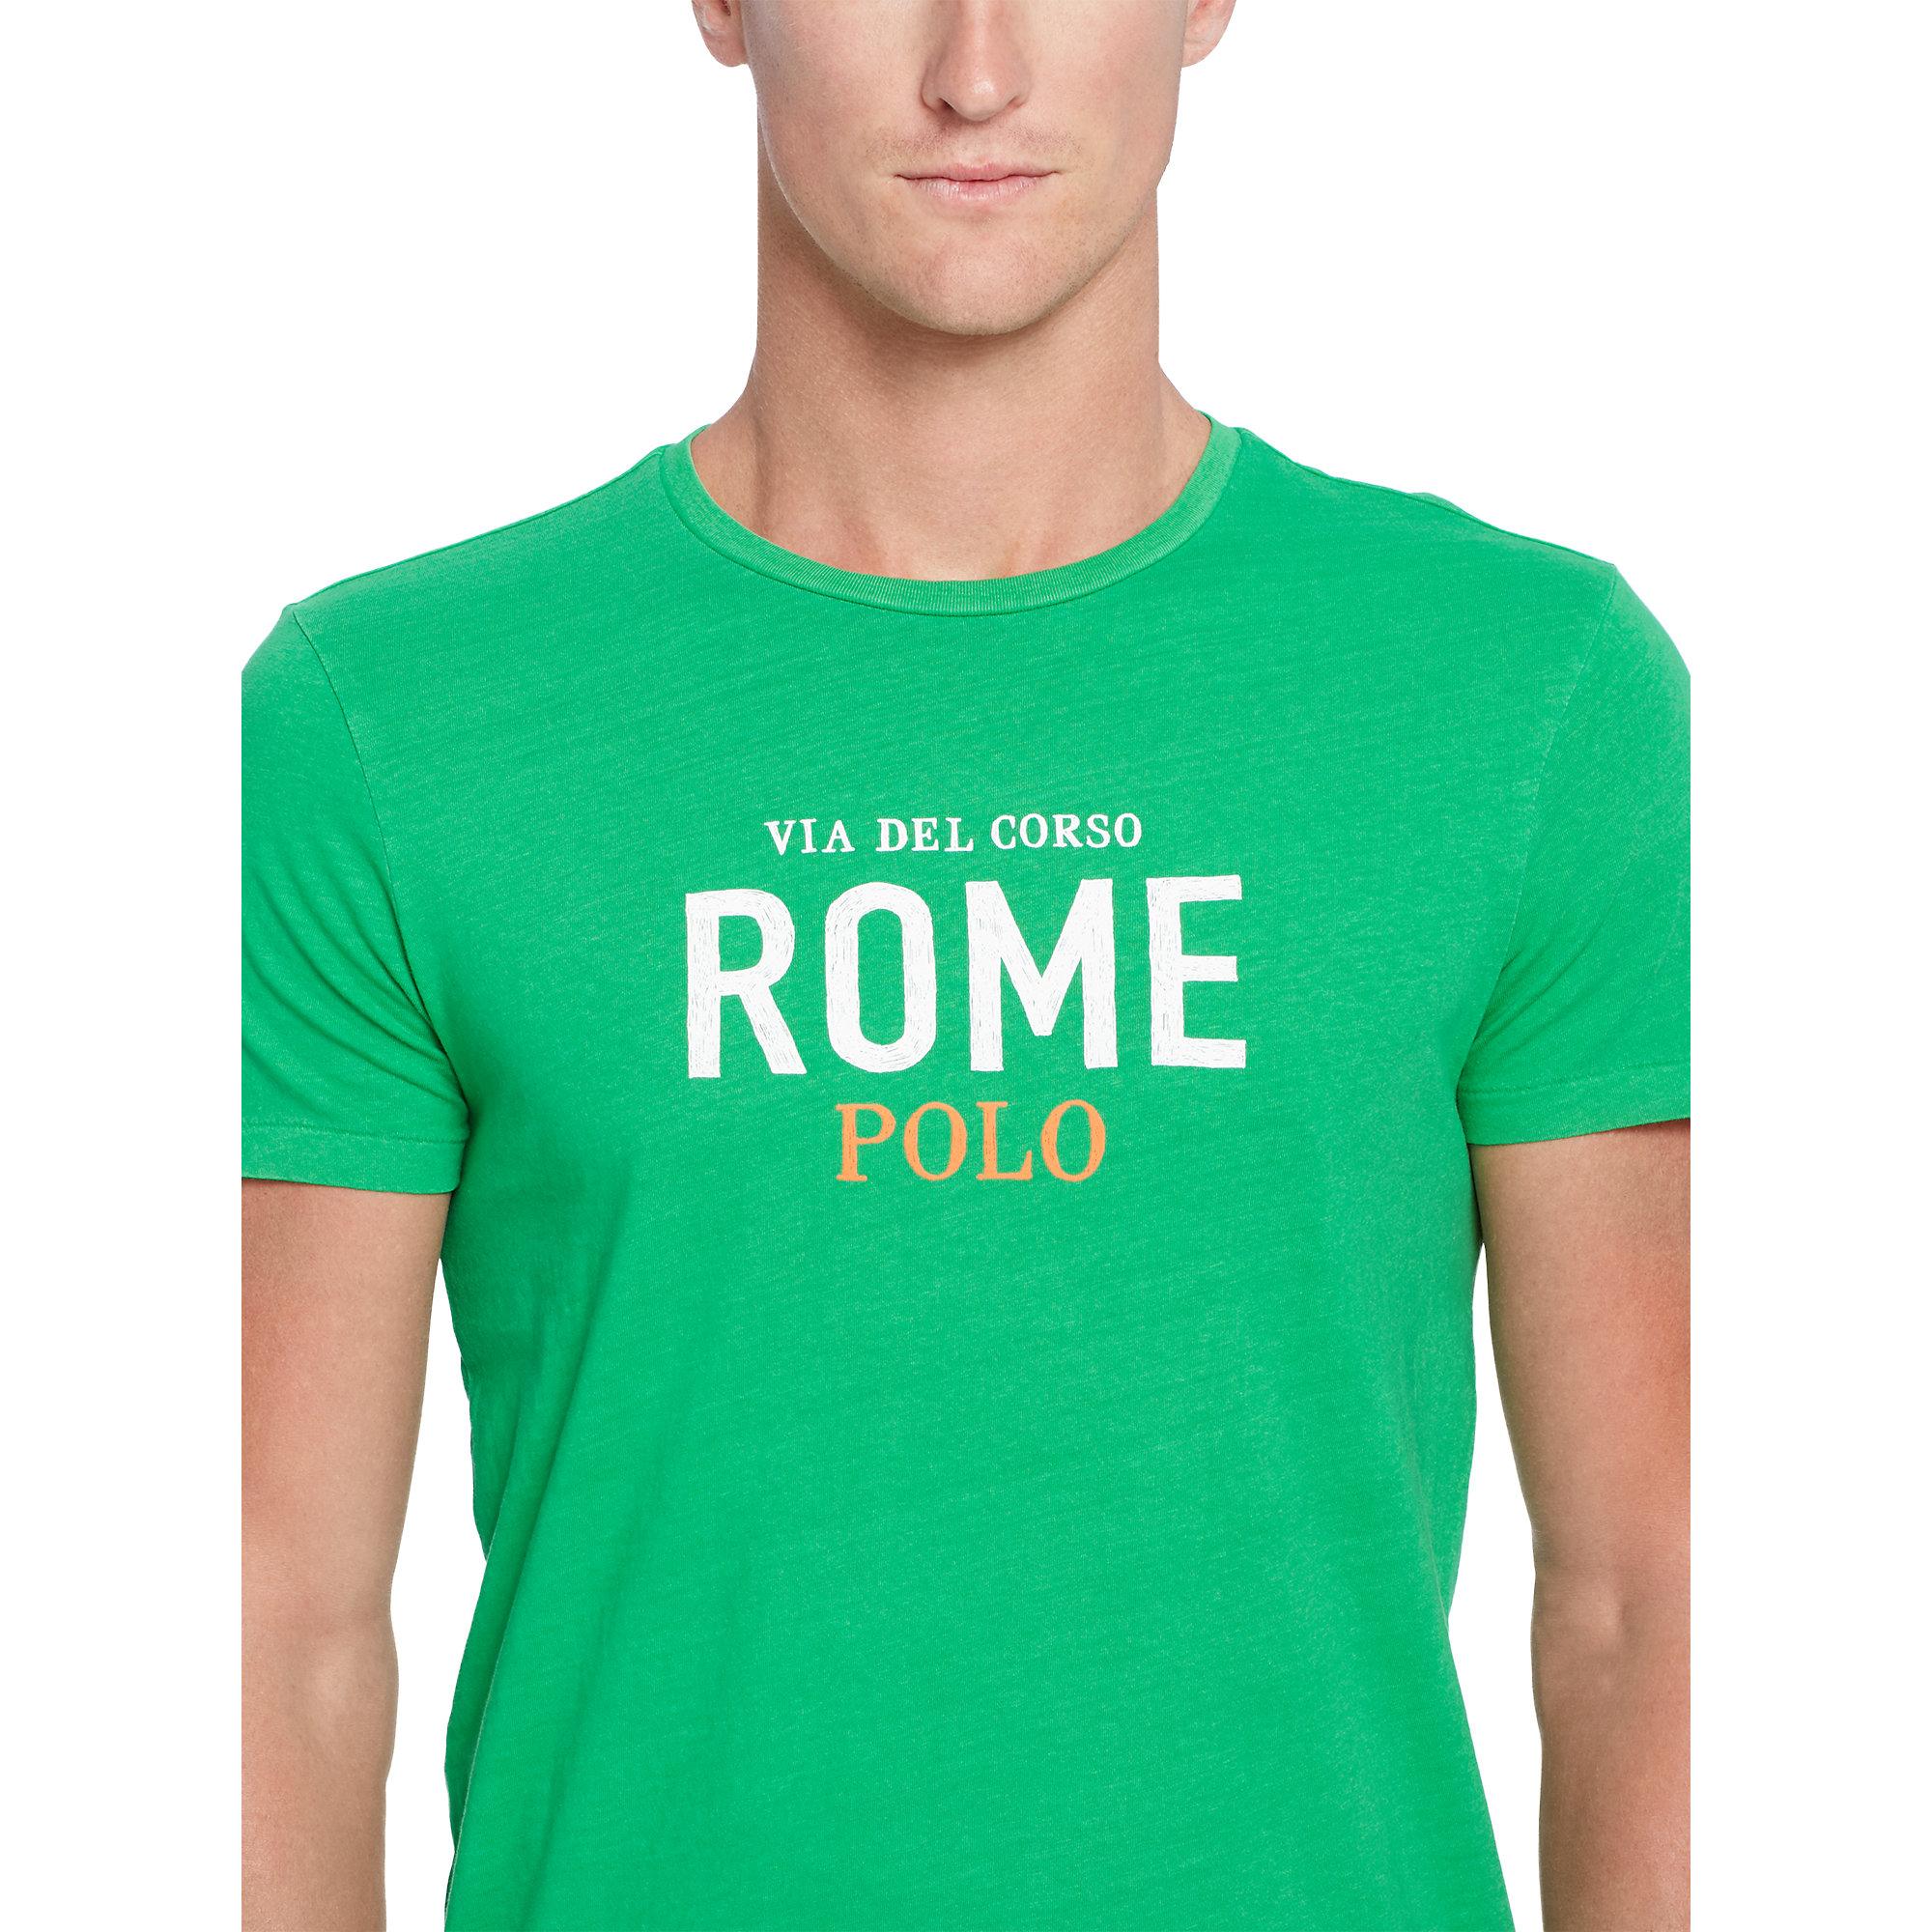 Polo ralph lauren custom fit graphic t shirt in green for for Polo custom fit t shirts